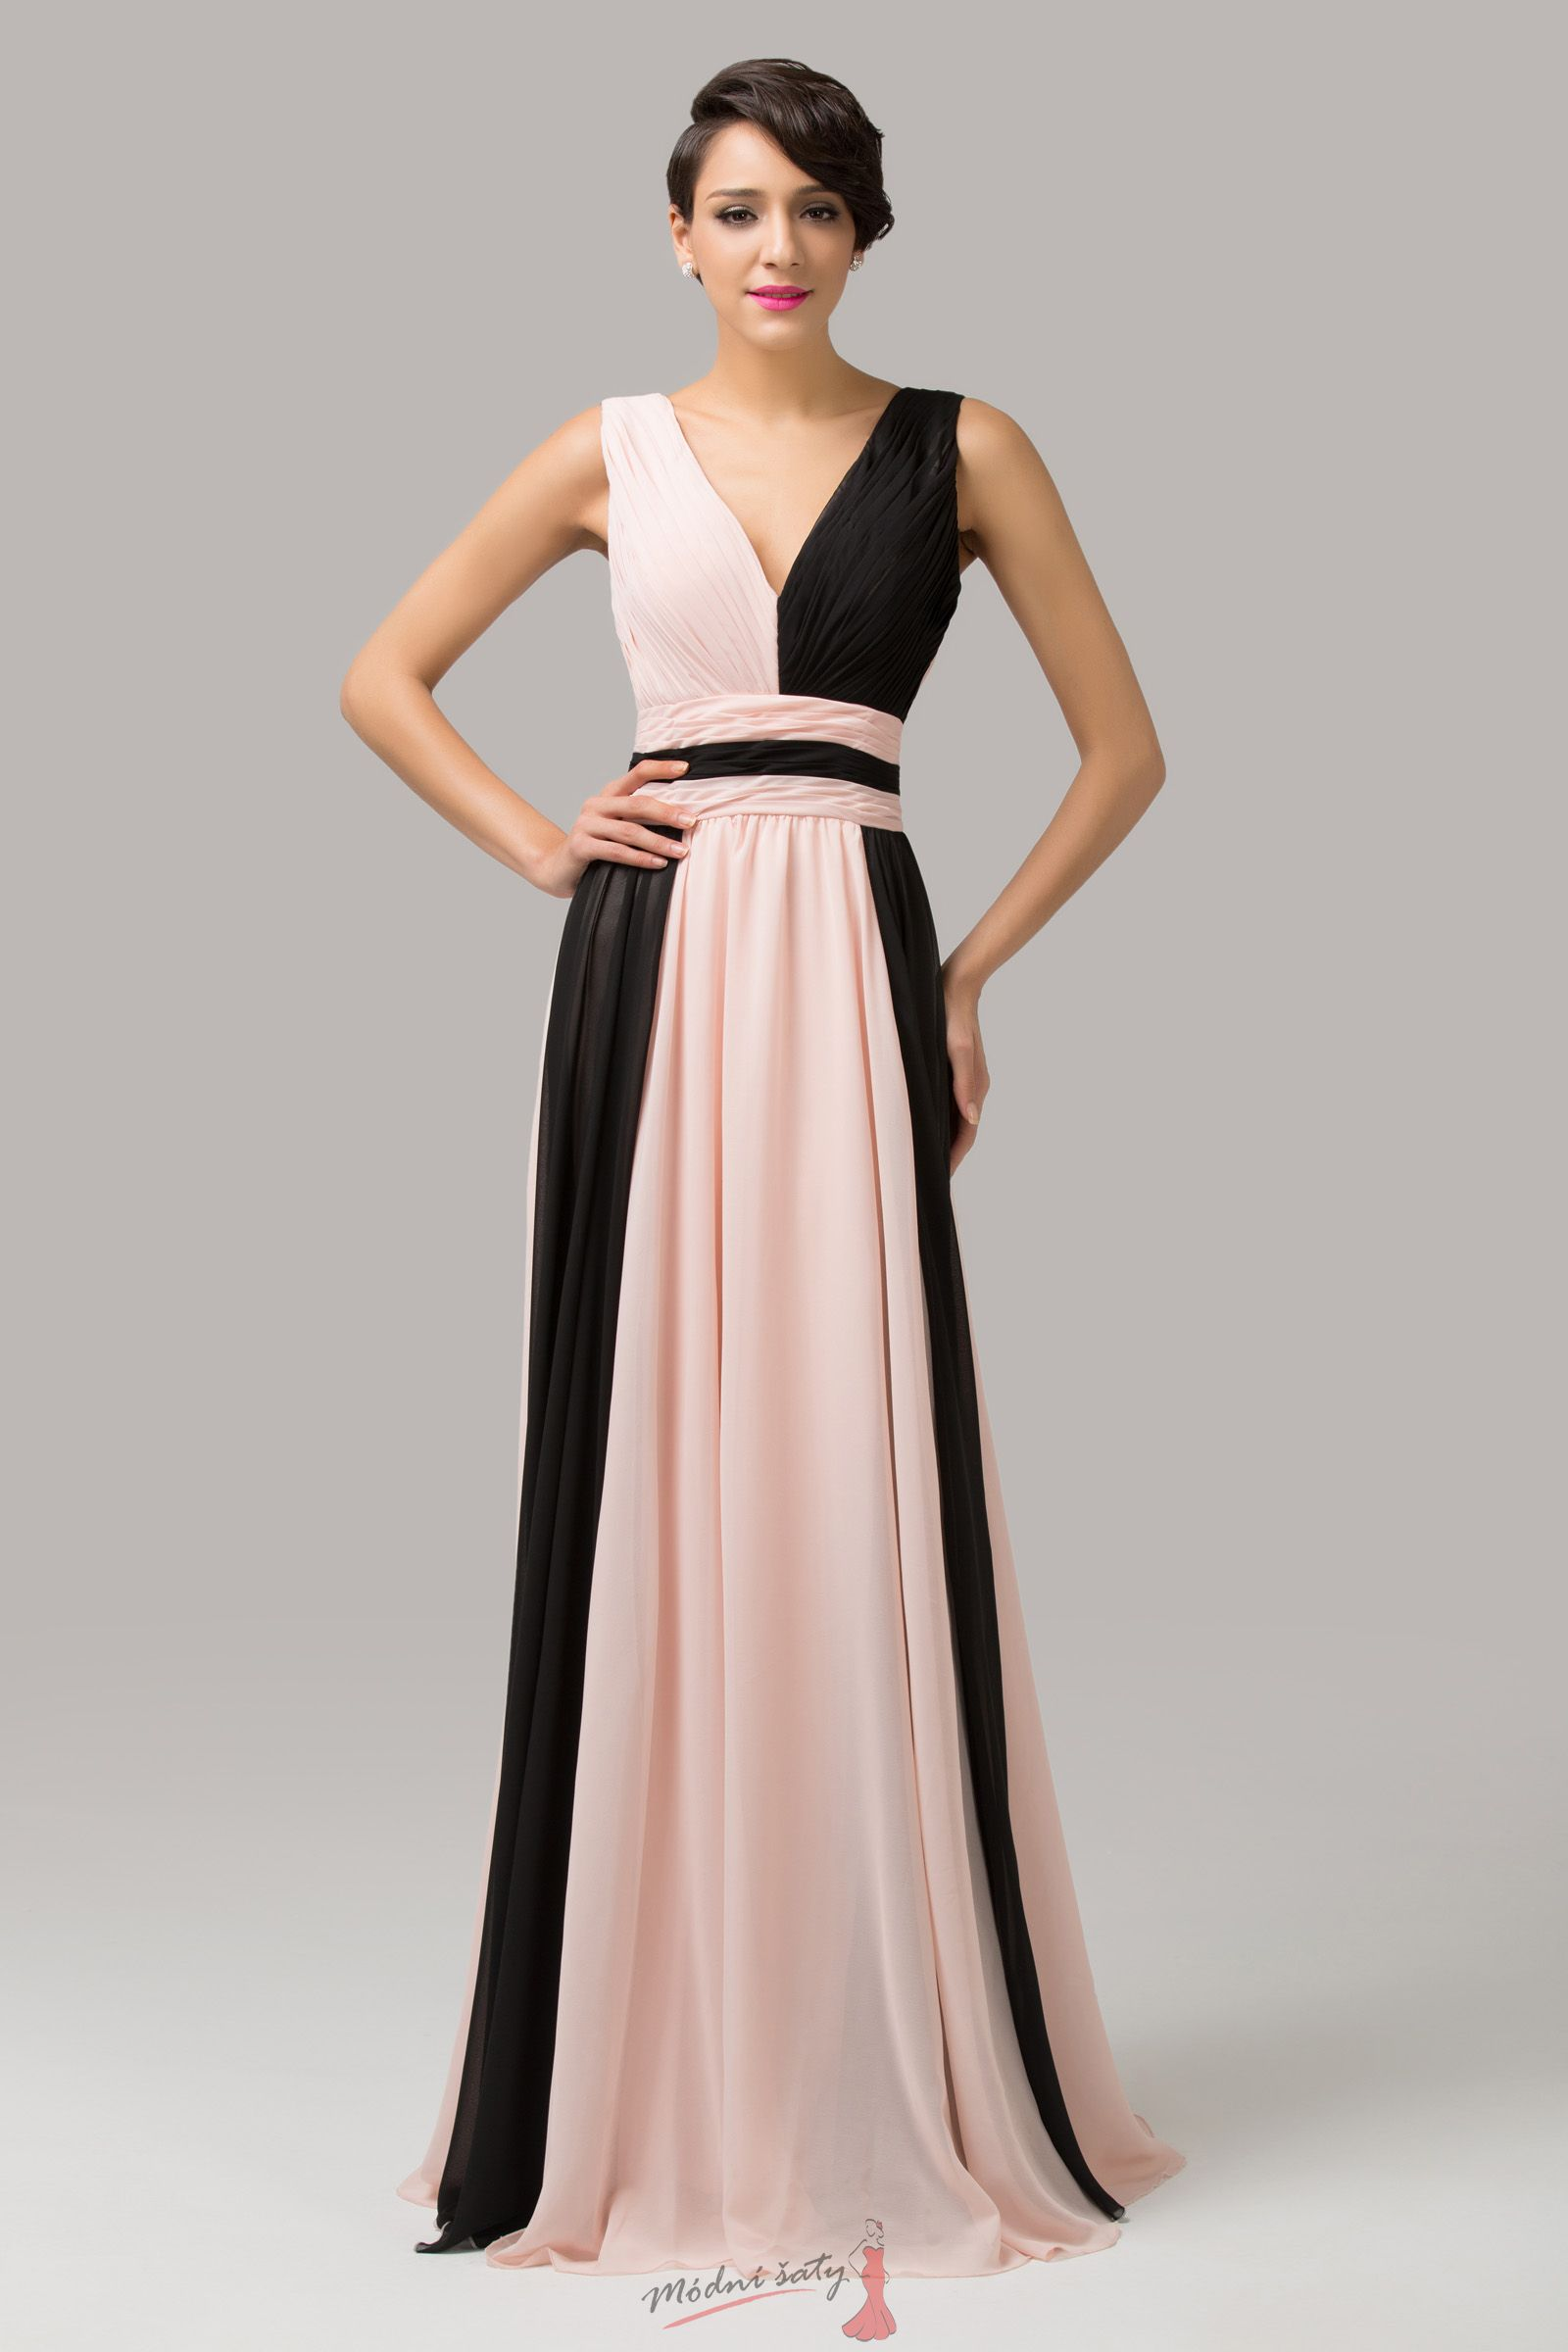 d53b59fc5e99 Dvoubarevné plesové šaty s výstřihem do V - více barev